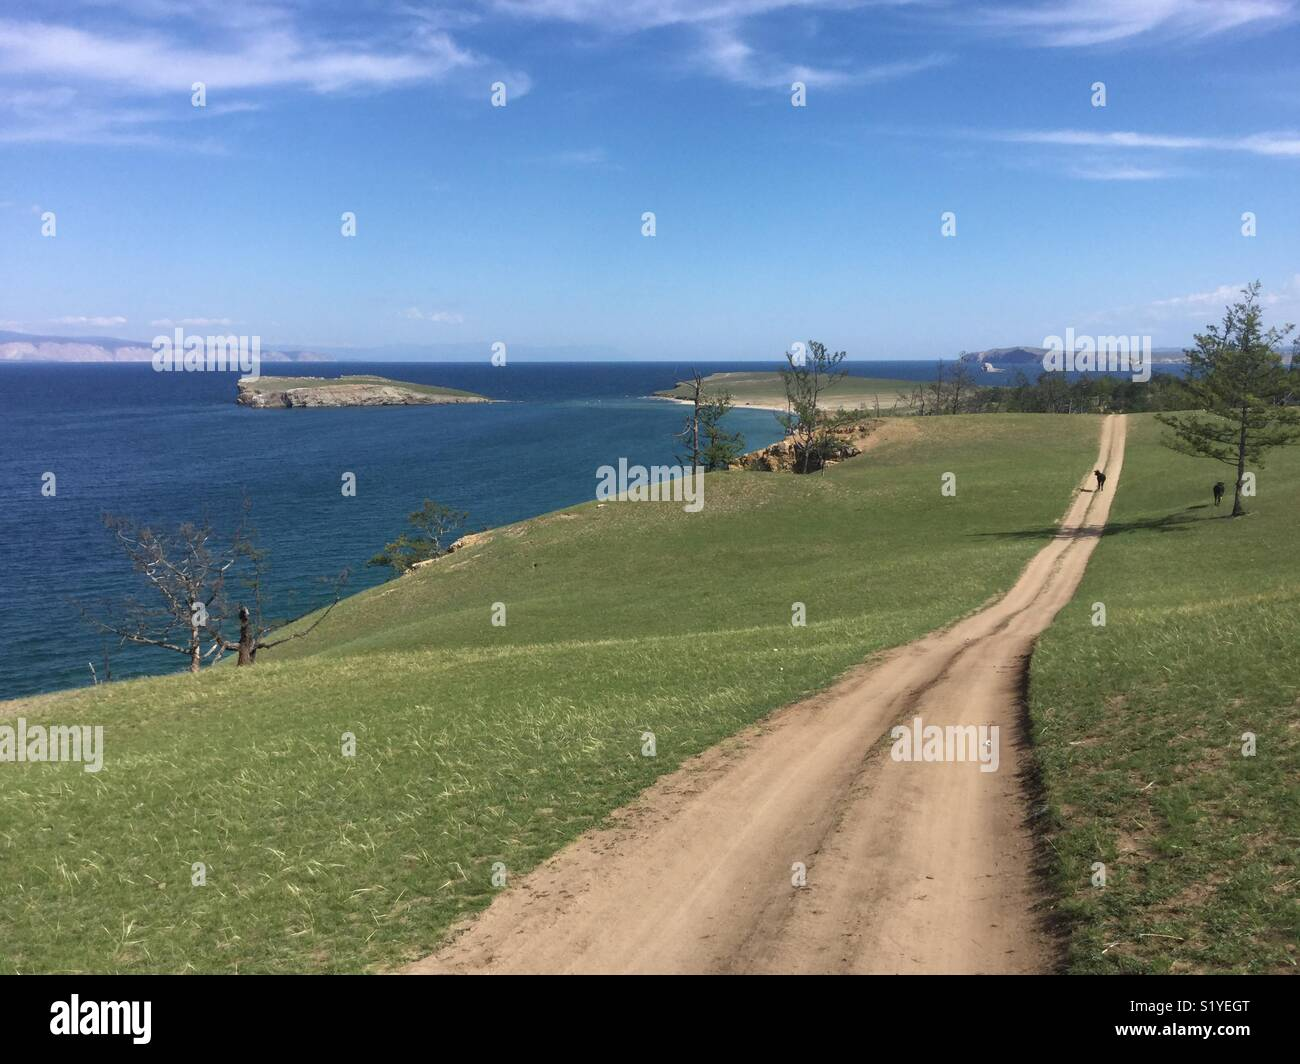 Olkhon island, empty road - Stock Image